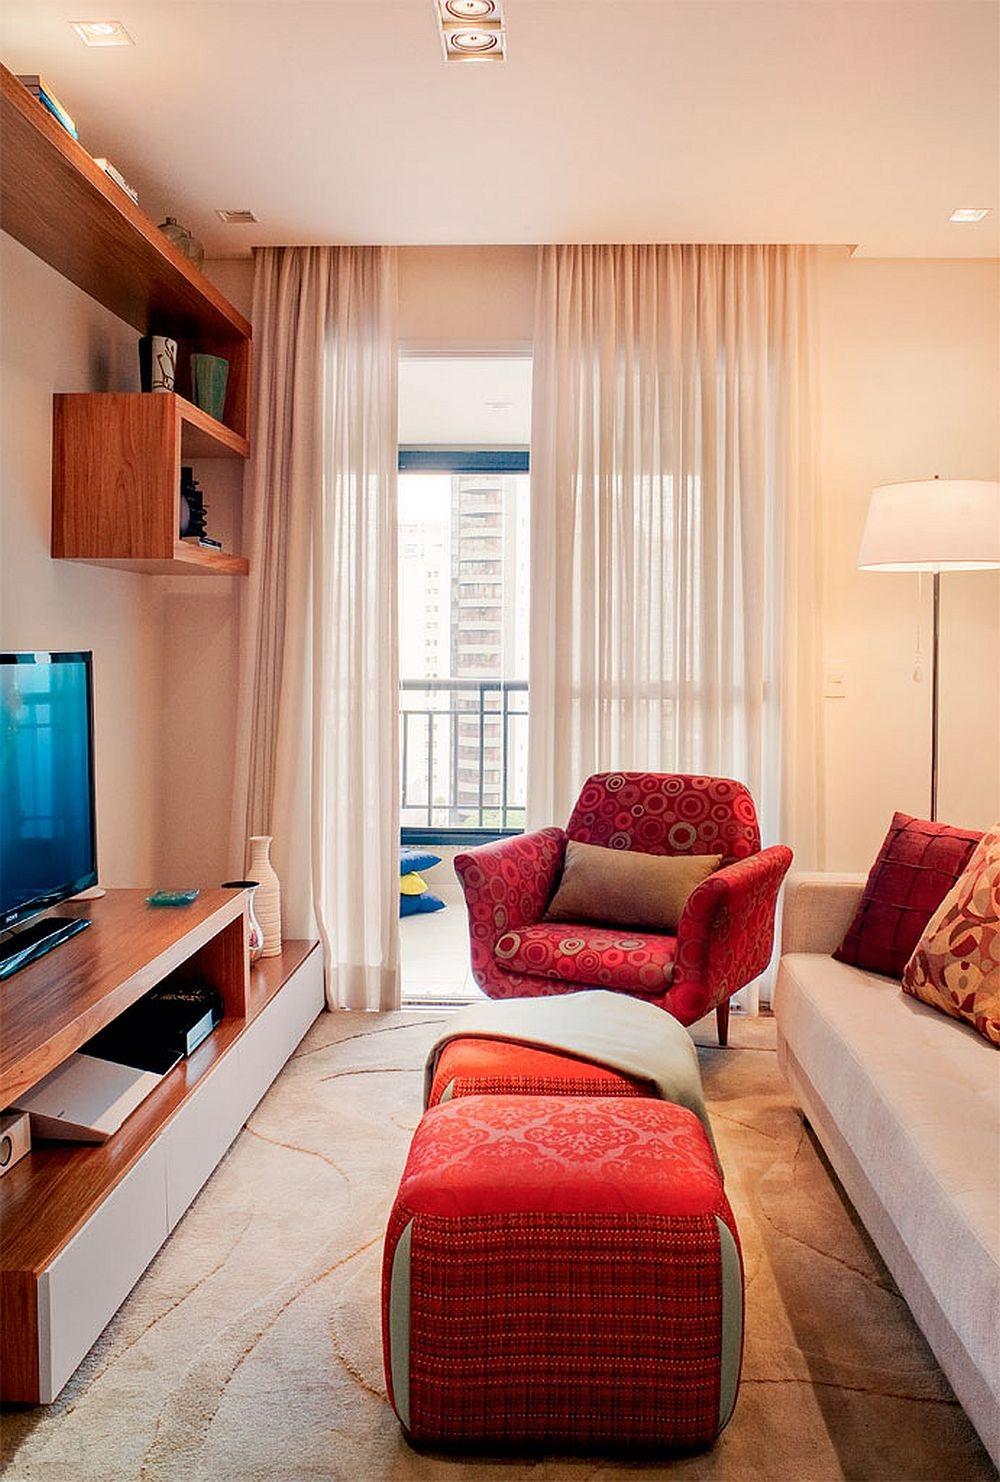 adelaparvu.com despre apartament de trei camere cu gratar pe balcon, designer Daniela Berardinelli (5)